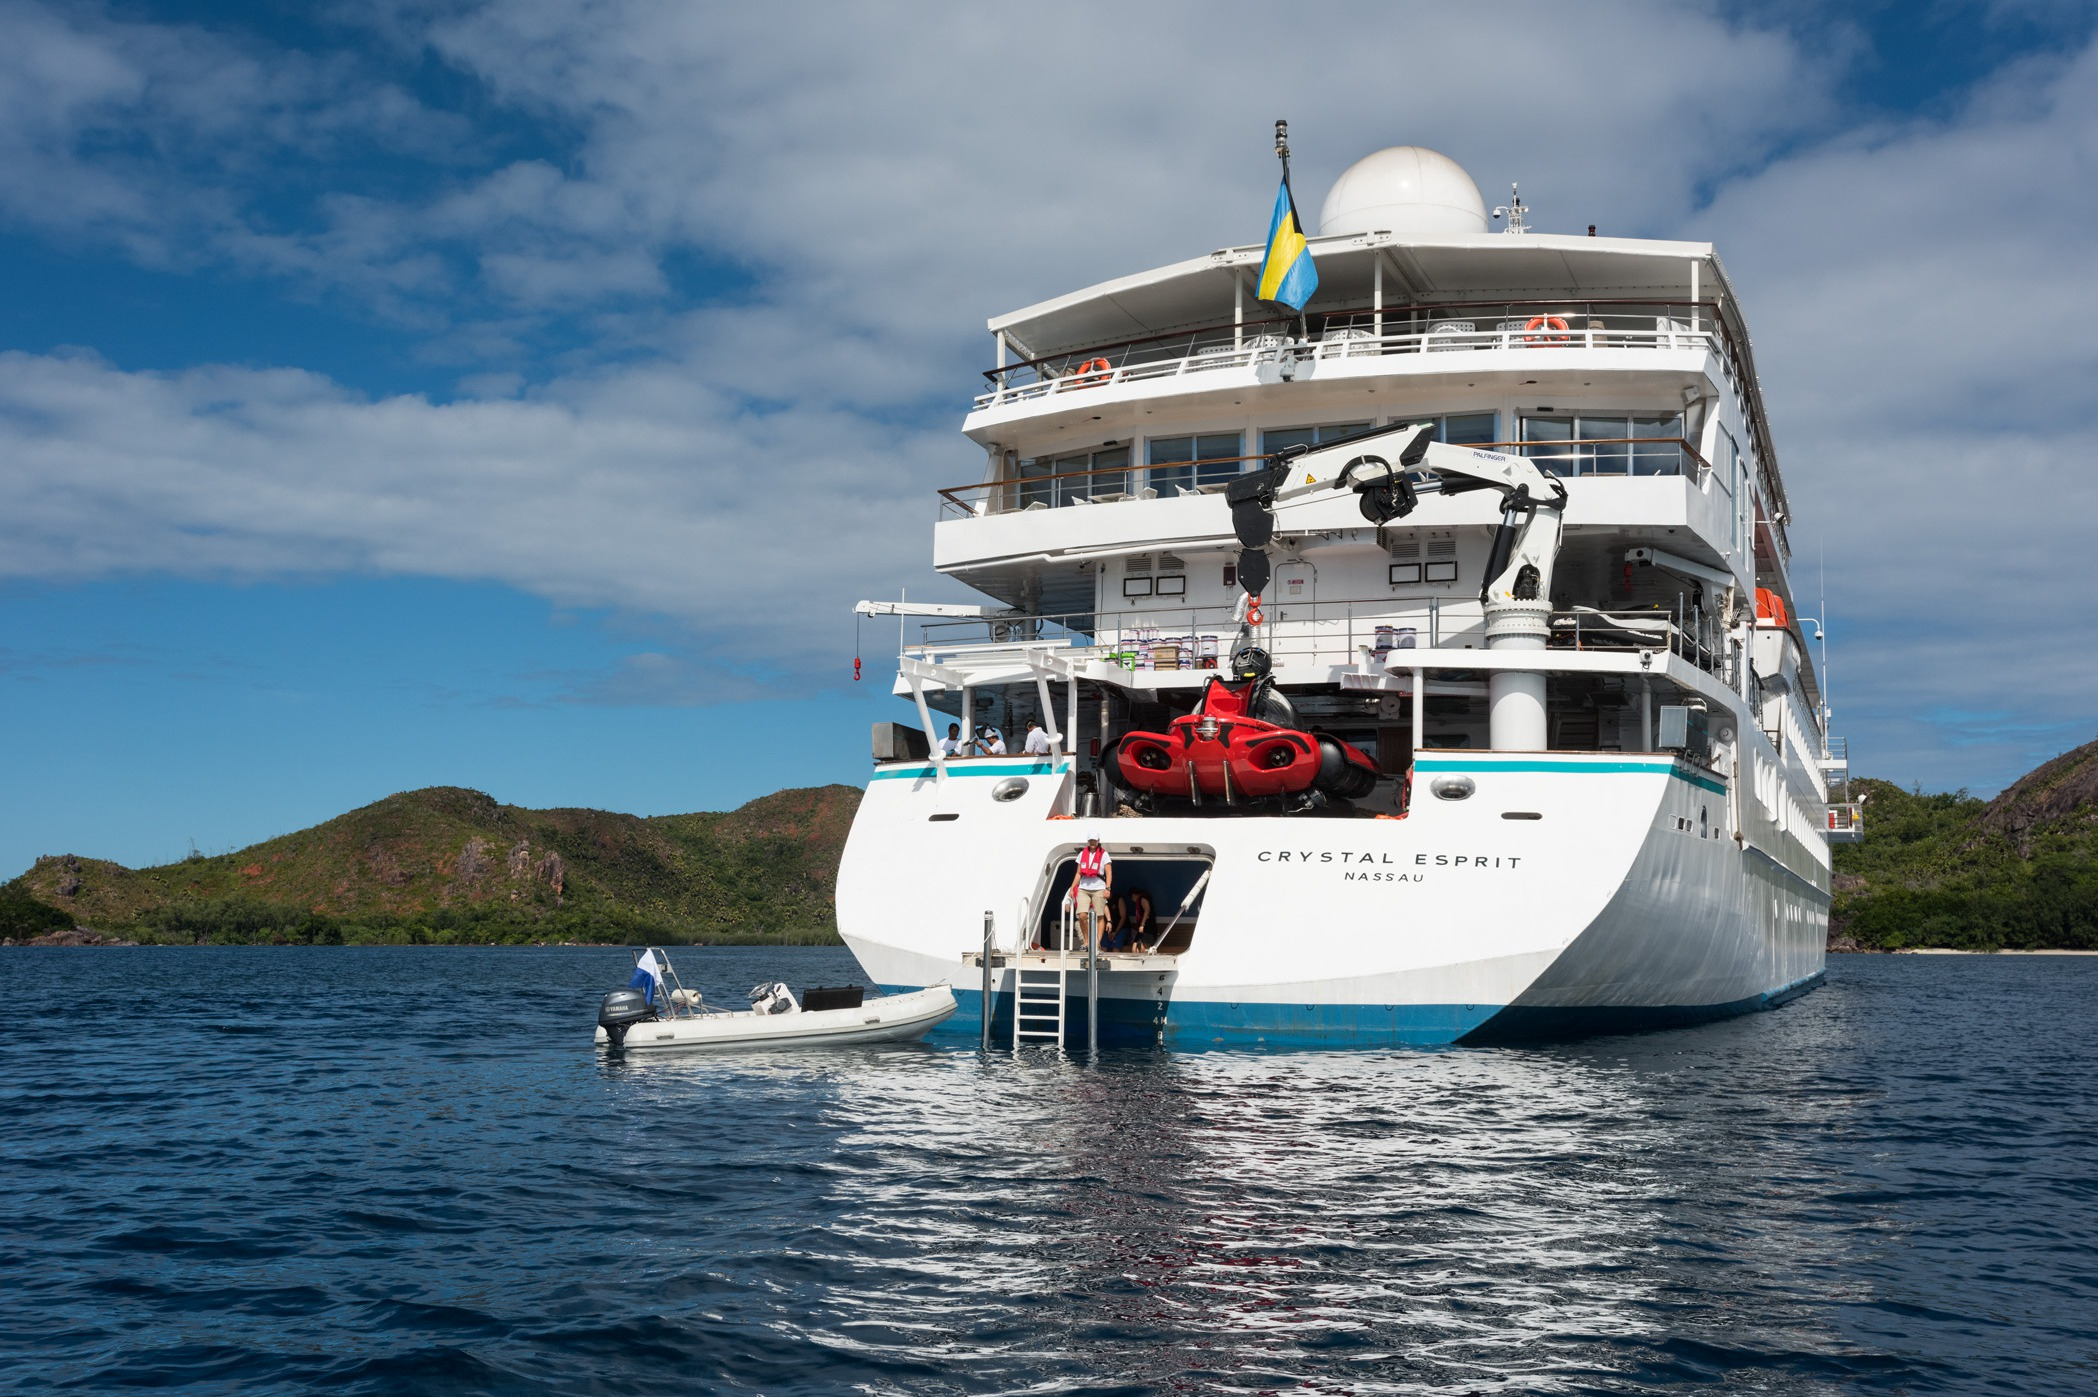 Crystal Cruises - Crystal Esprit marina